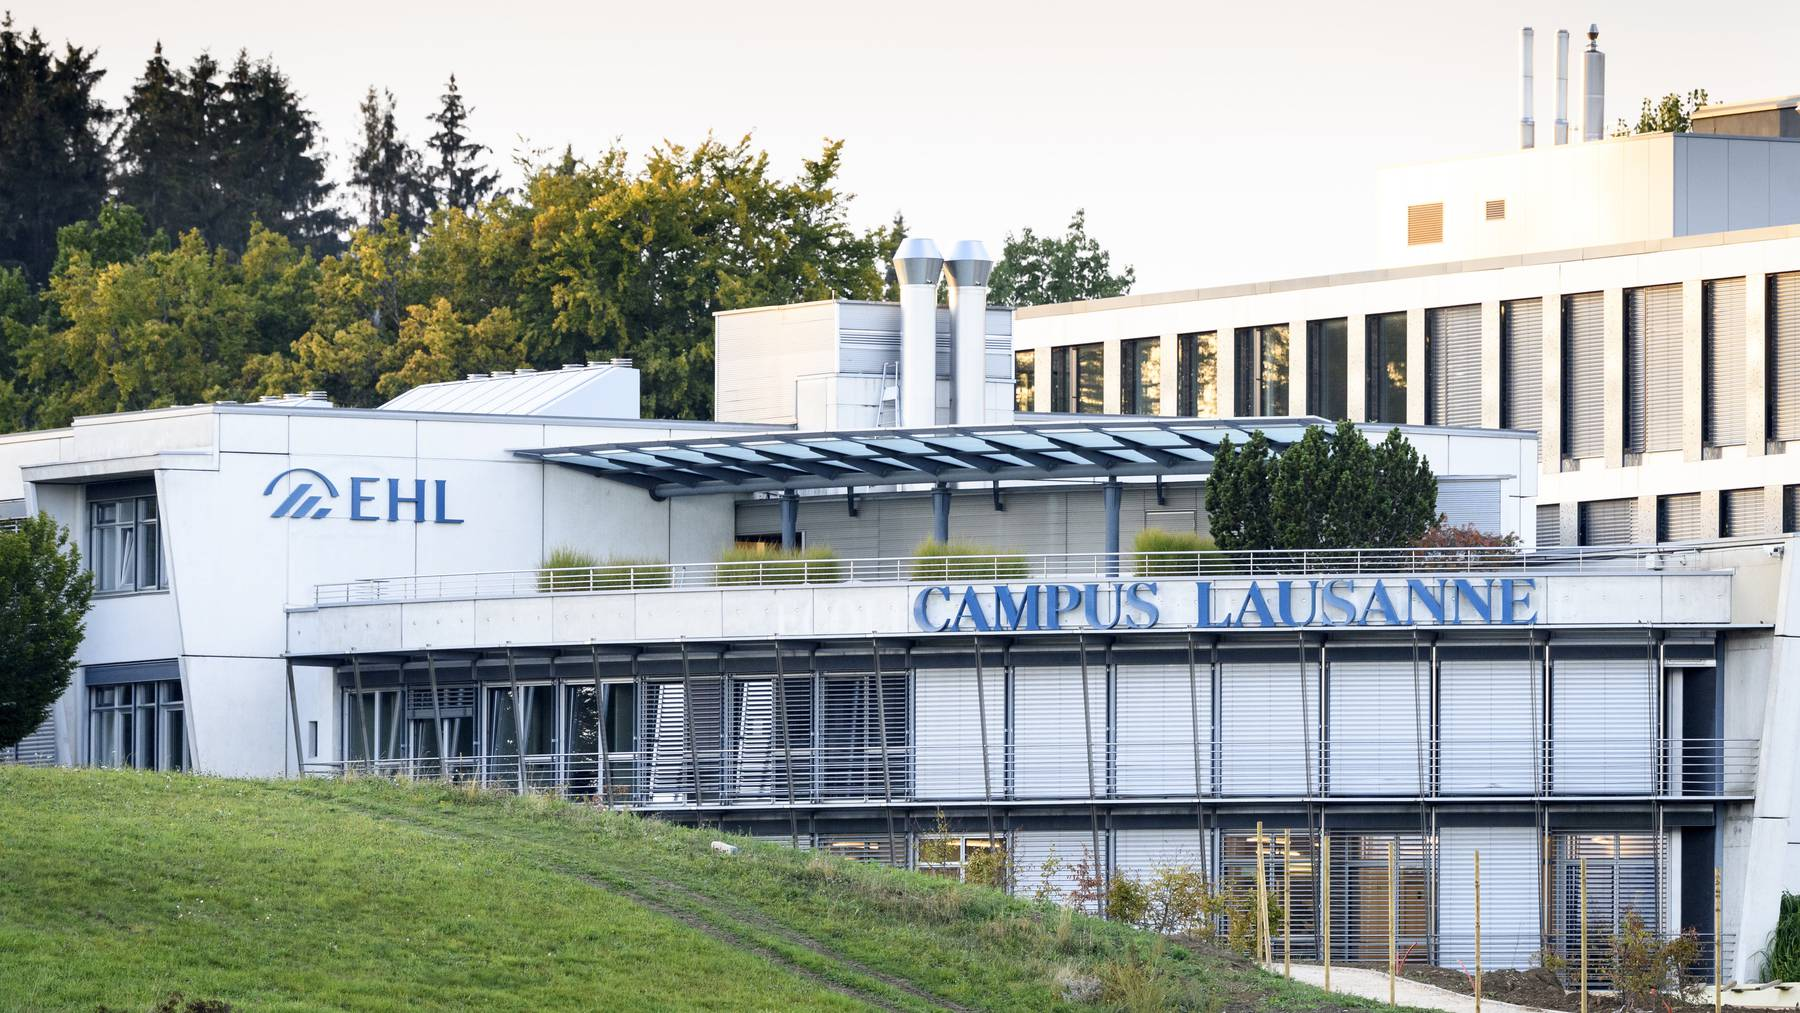 Der gesamte Bachelor-Studiengang der Ecole Hôtelière de Lausanne muss wegen mehreren Coronainfektionsherden in Quarantäne.